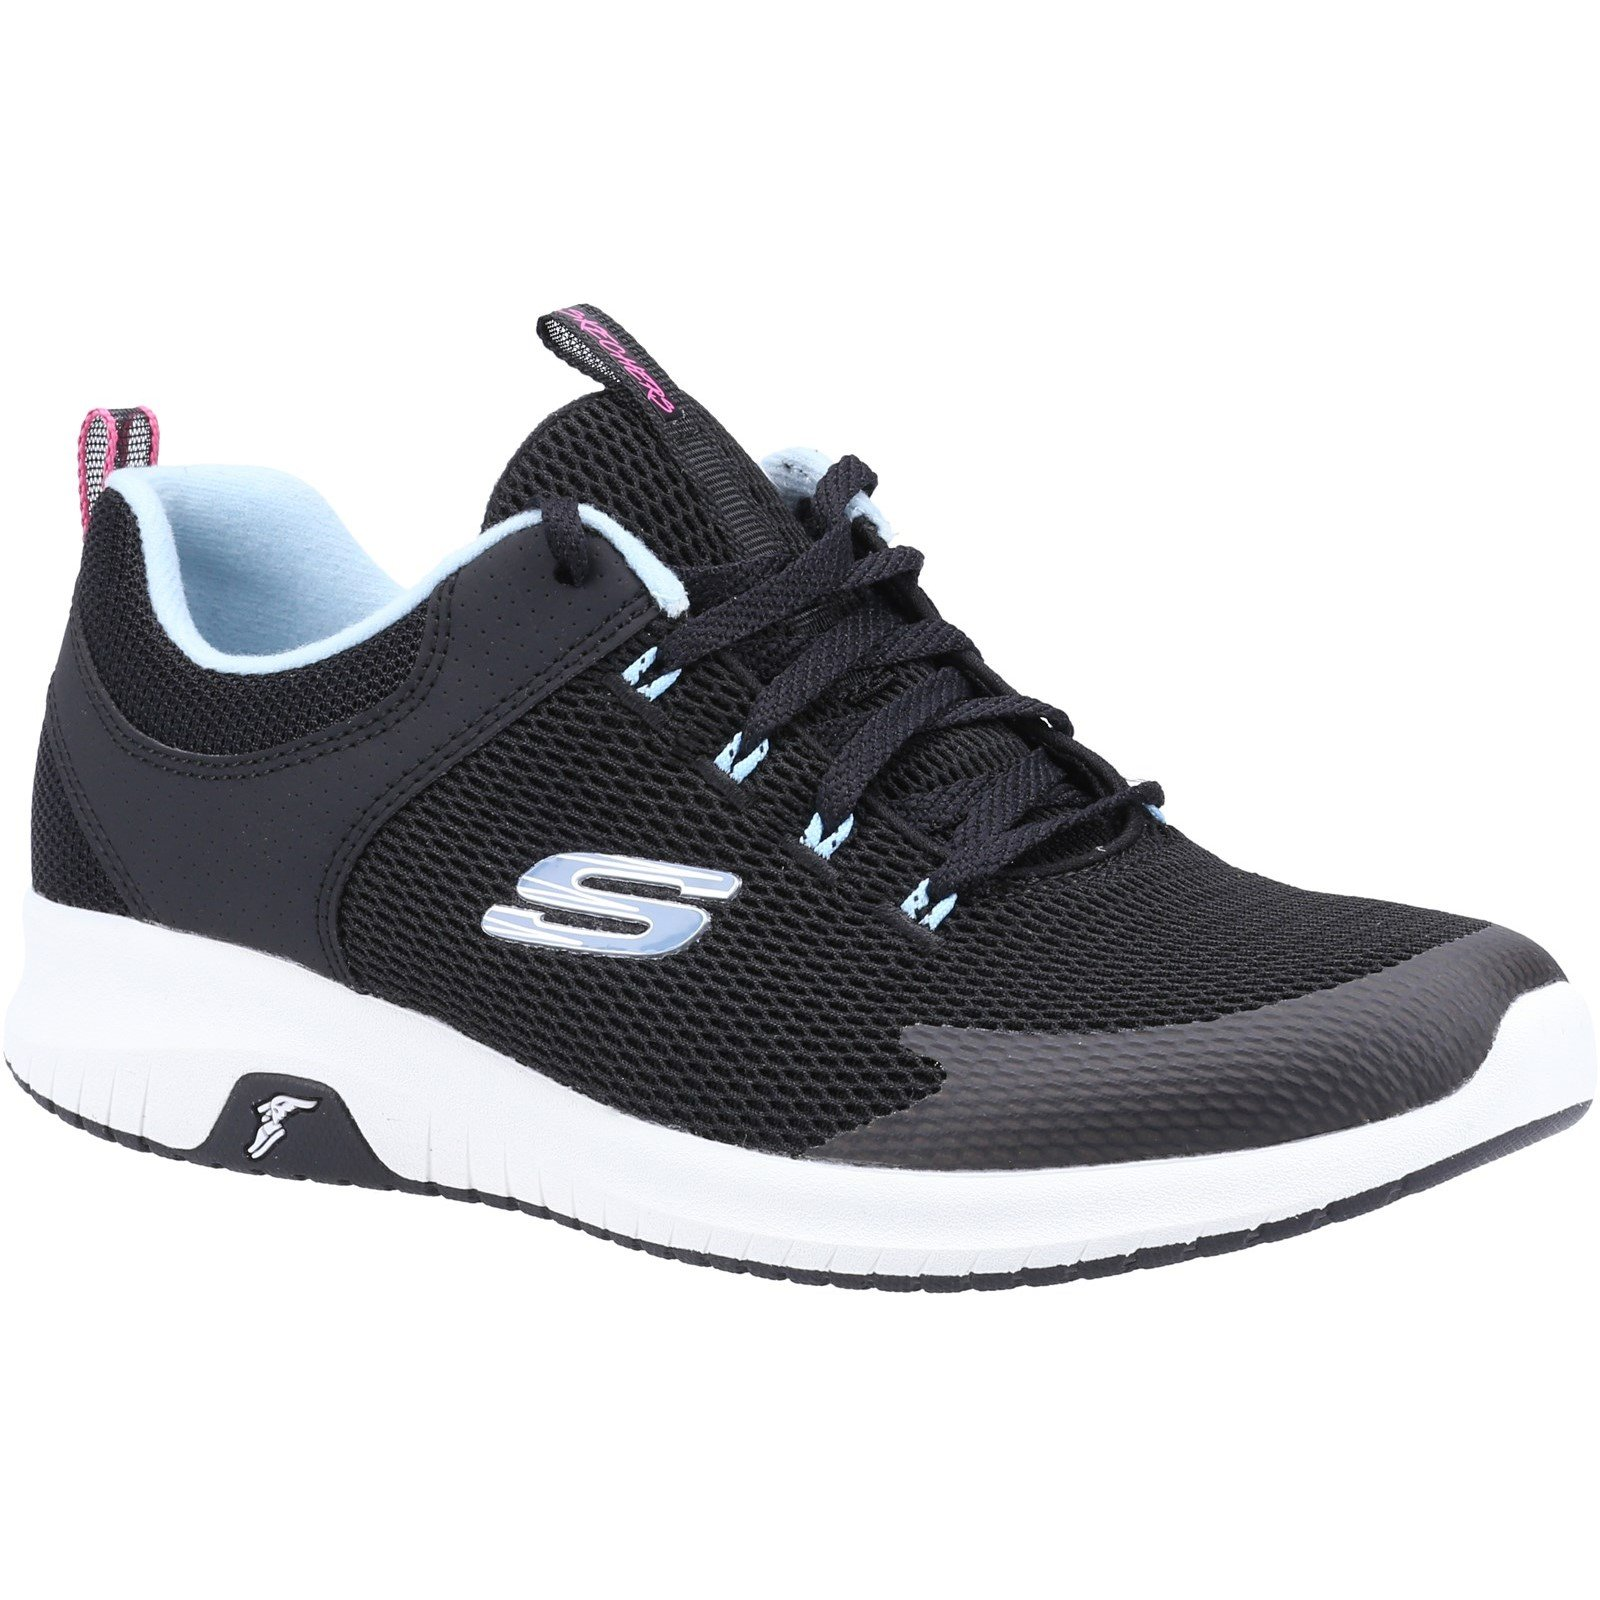 Skechers Women's Ultra Flex Prime Step Out Trainer Multicolor 32112 - Black/Light Blue 8